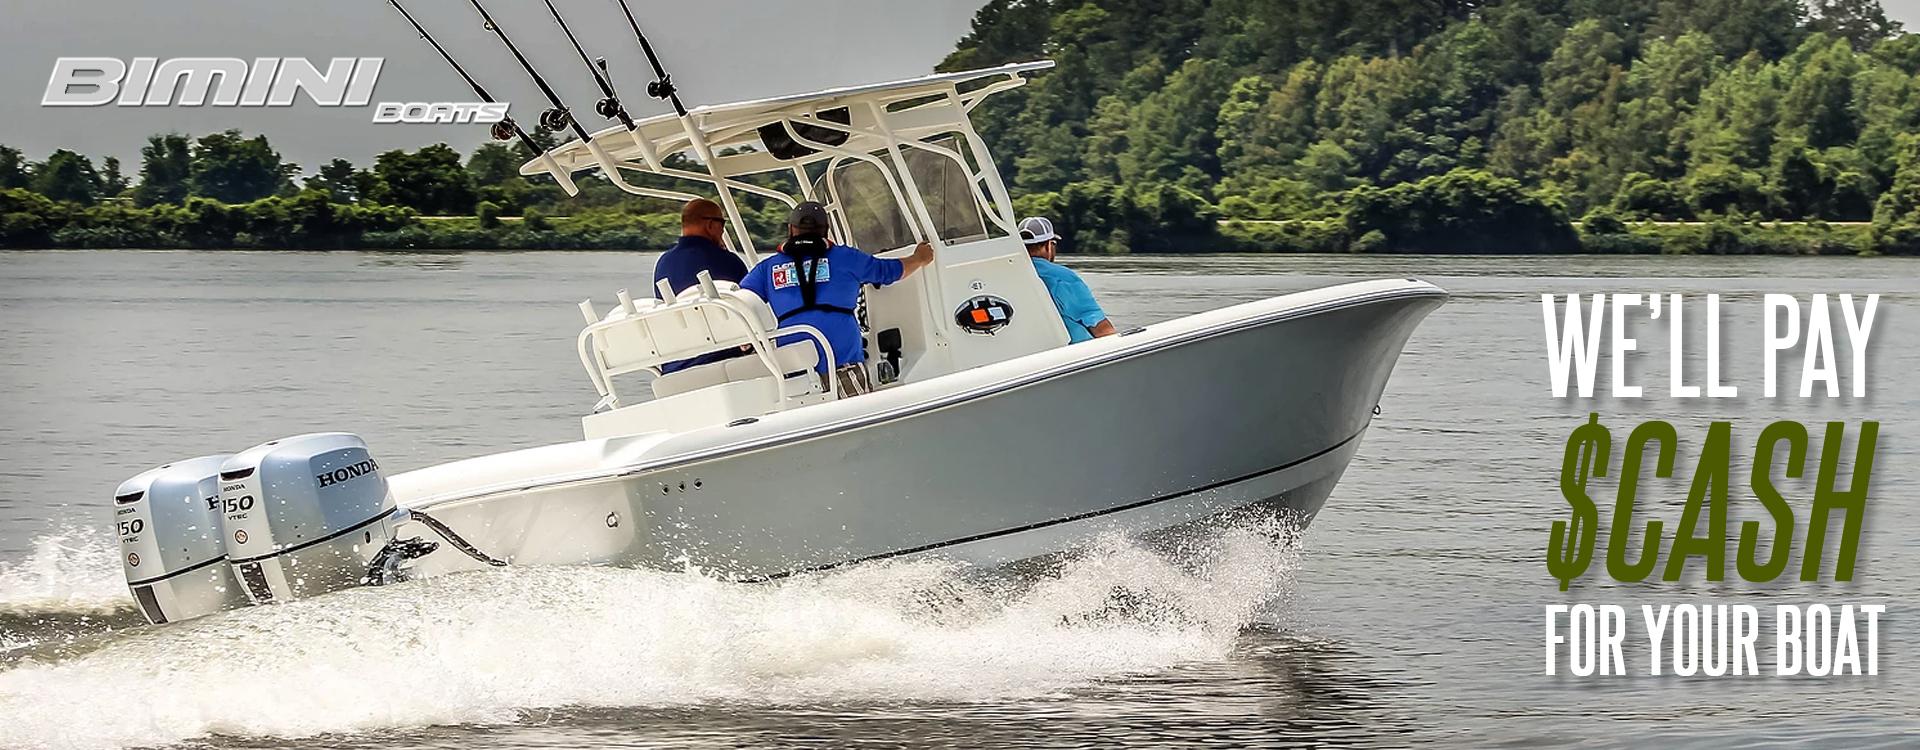 Top Notch Marine Full Service Boat Dealership